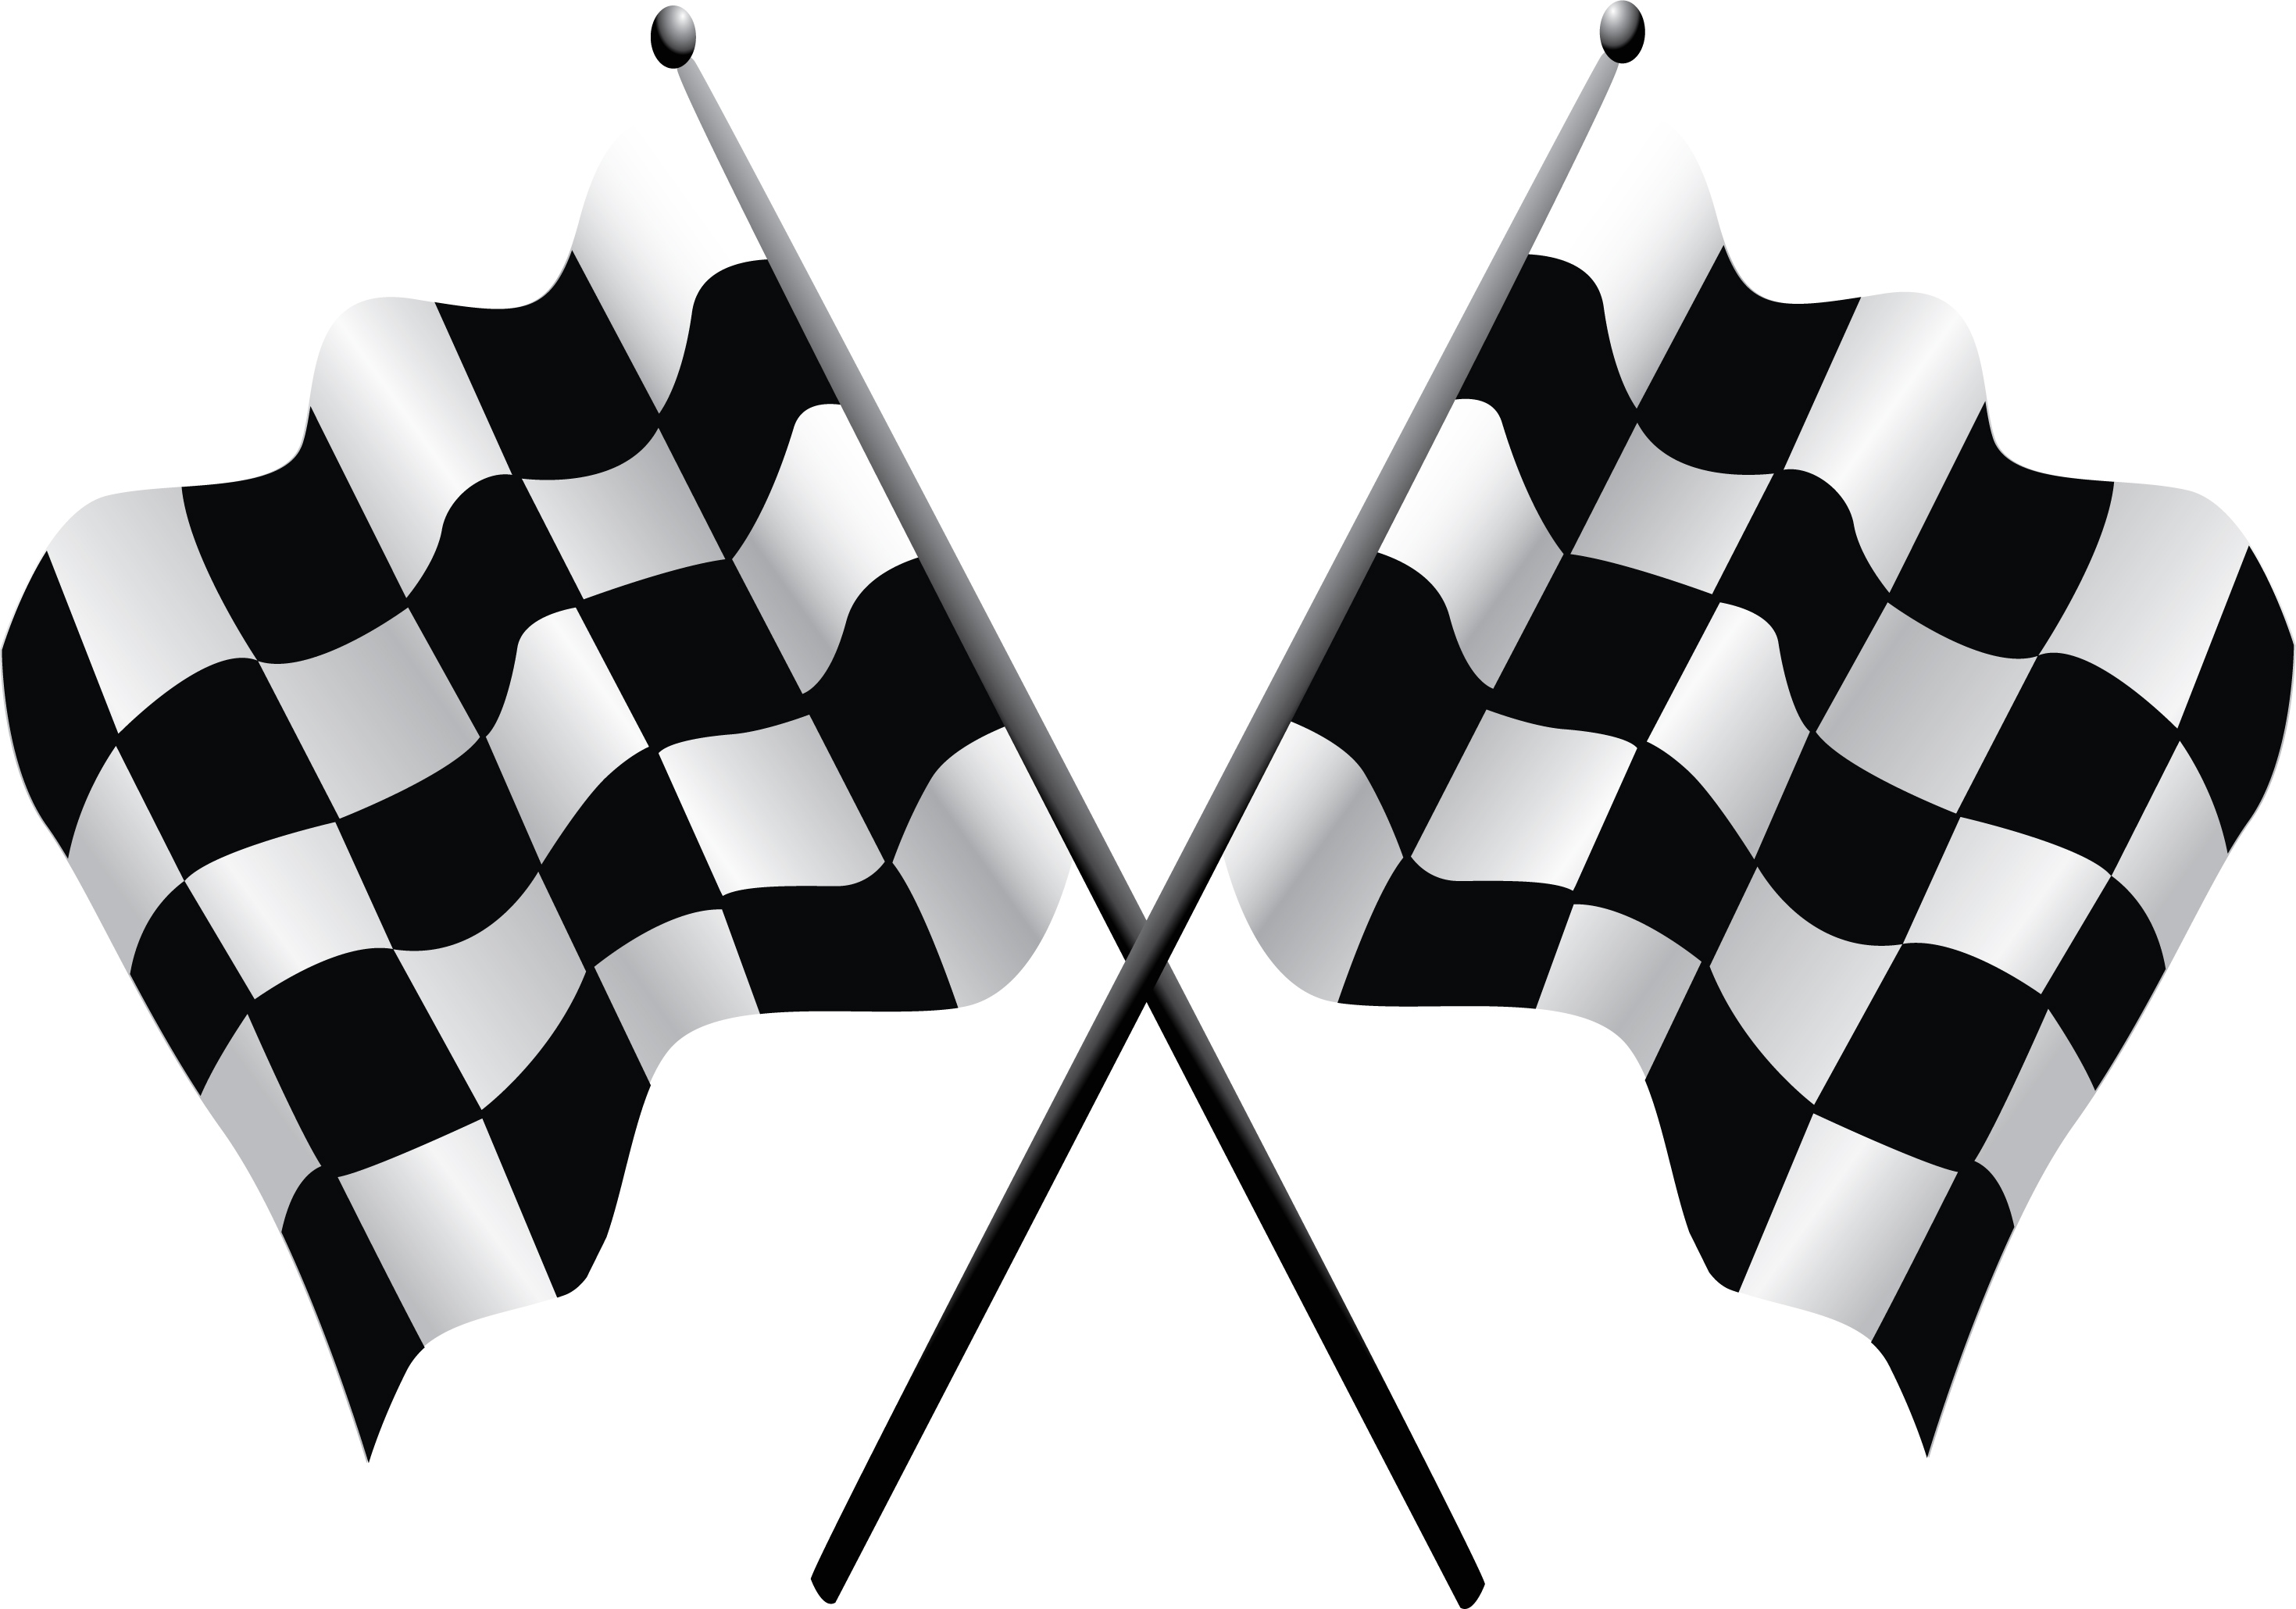 Transparent Checkered Flag Clipart.